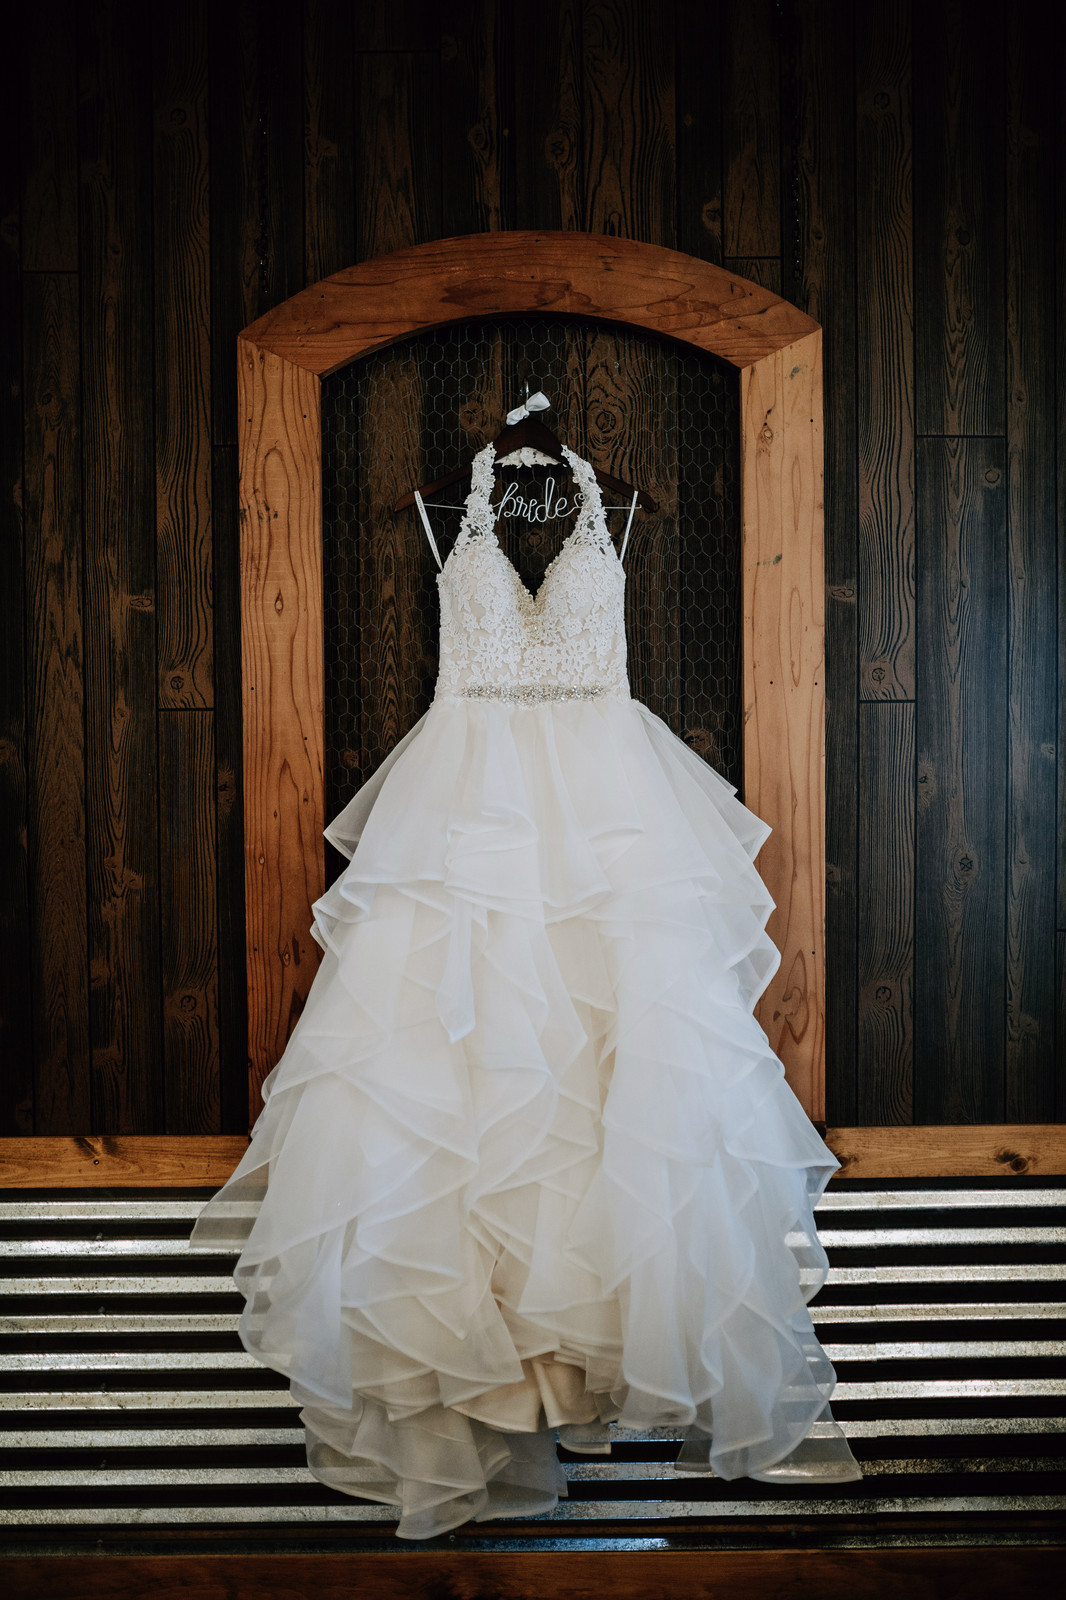 Wedding Dress Hanger.Wedding Dresses Wedding Photography Wedding Dress Photos Bride